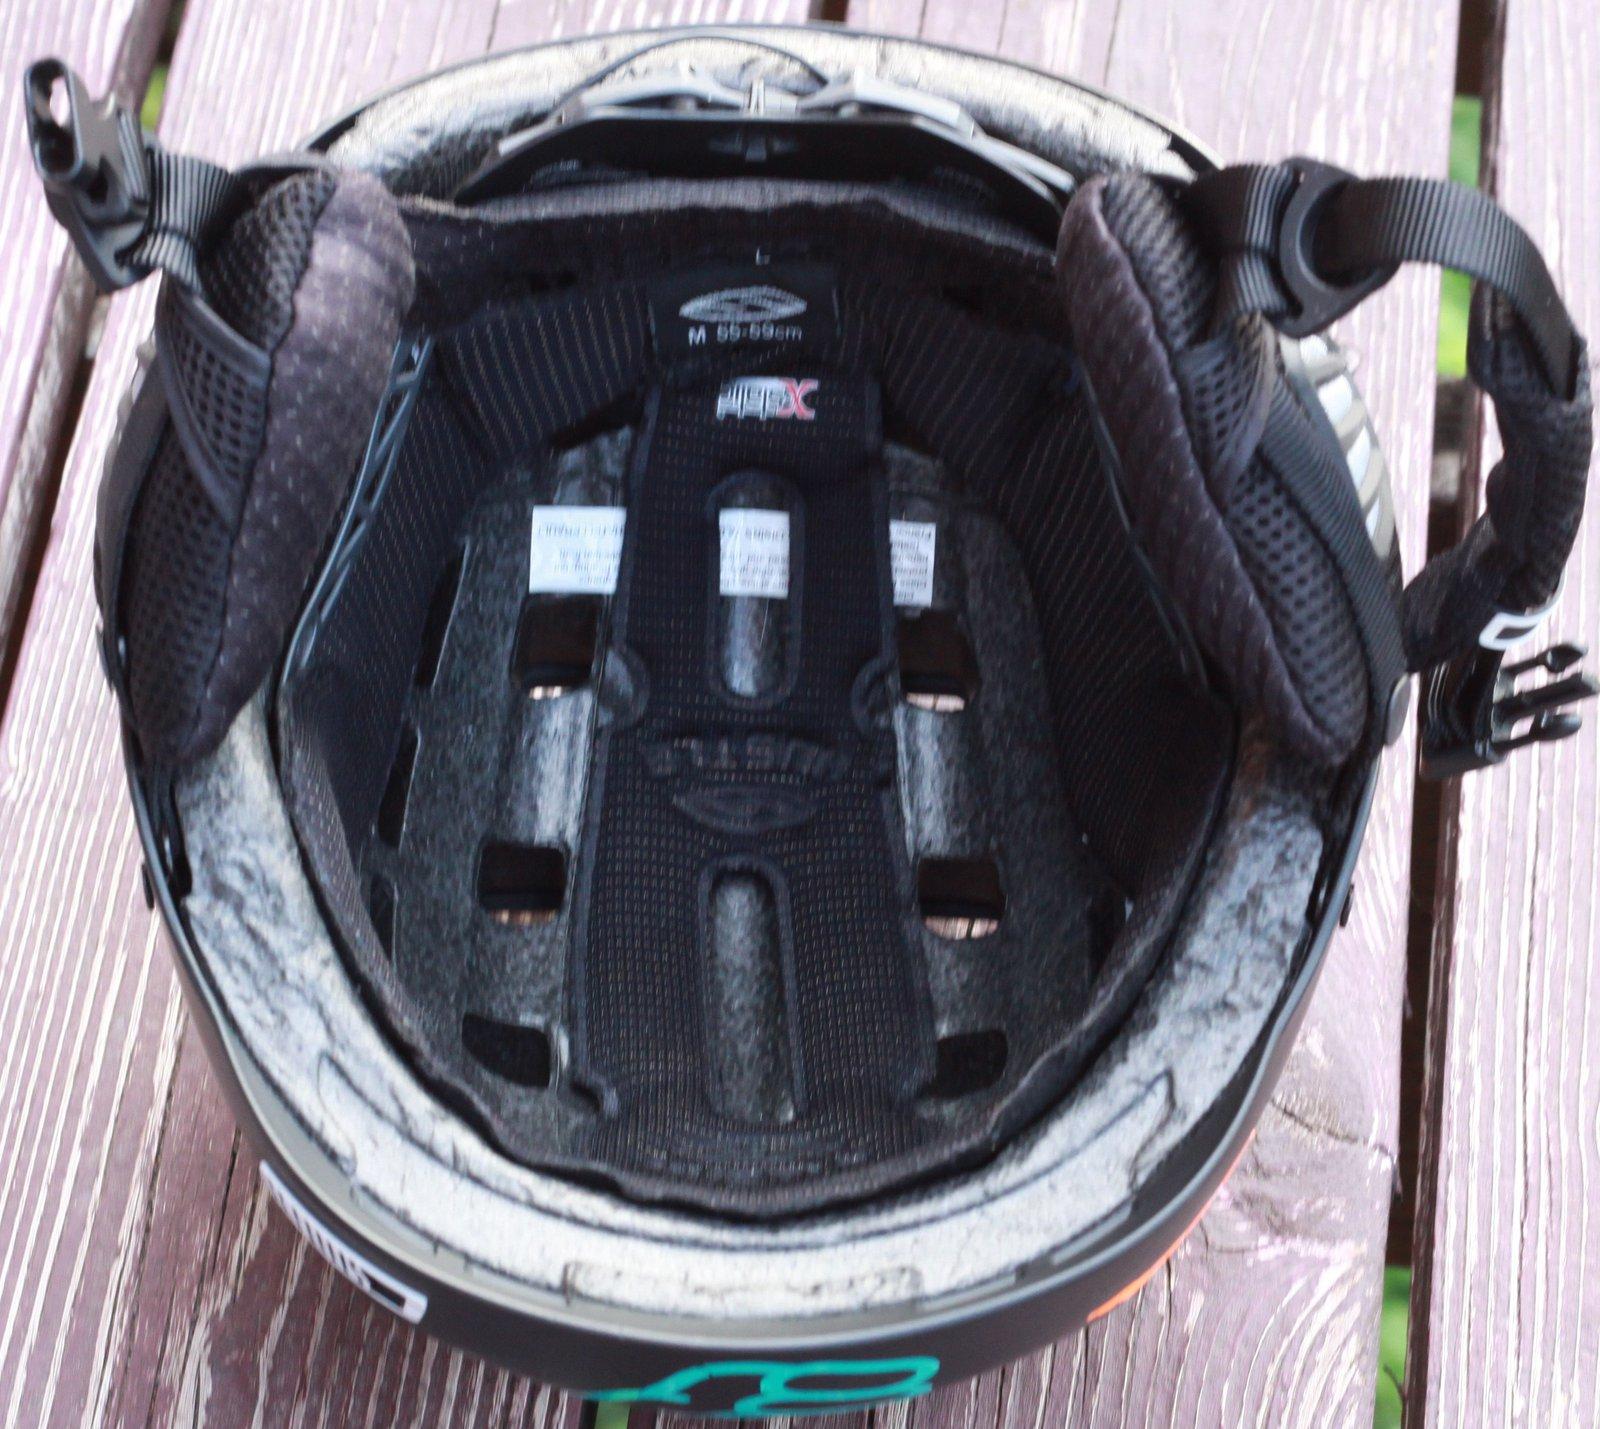 Ski gear - 8 of 17